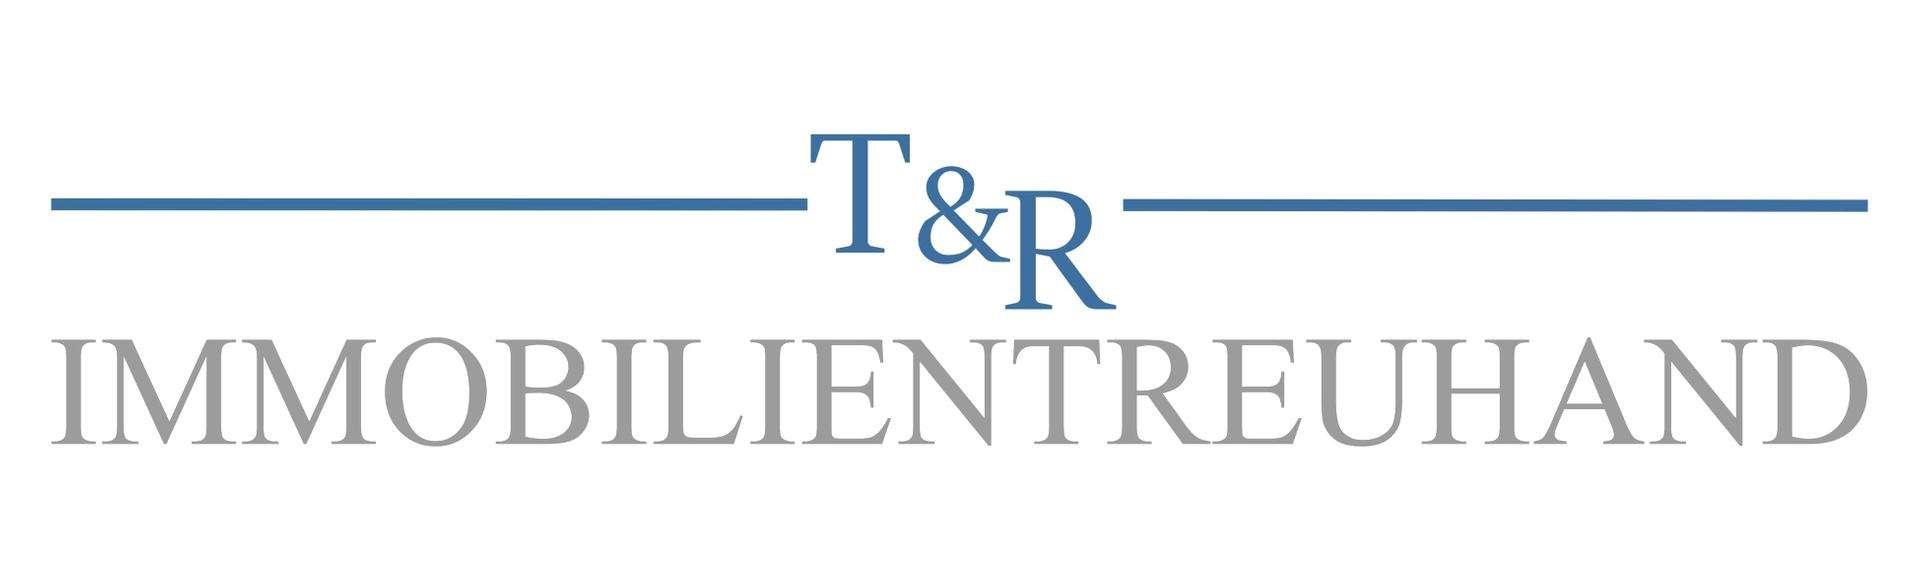 Makler T&R Immobilientreuhand GmbH logo